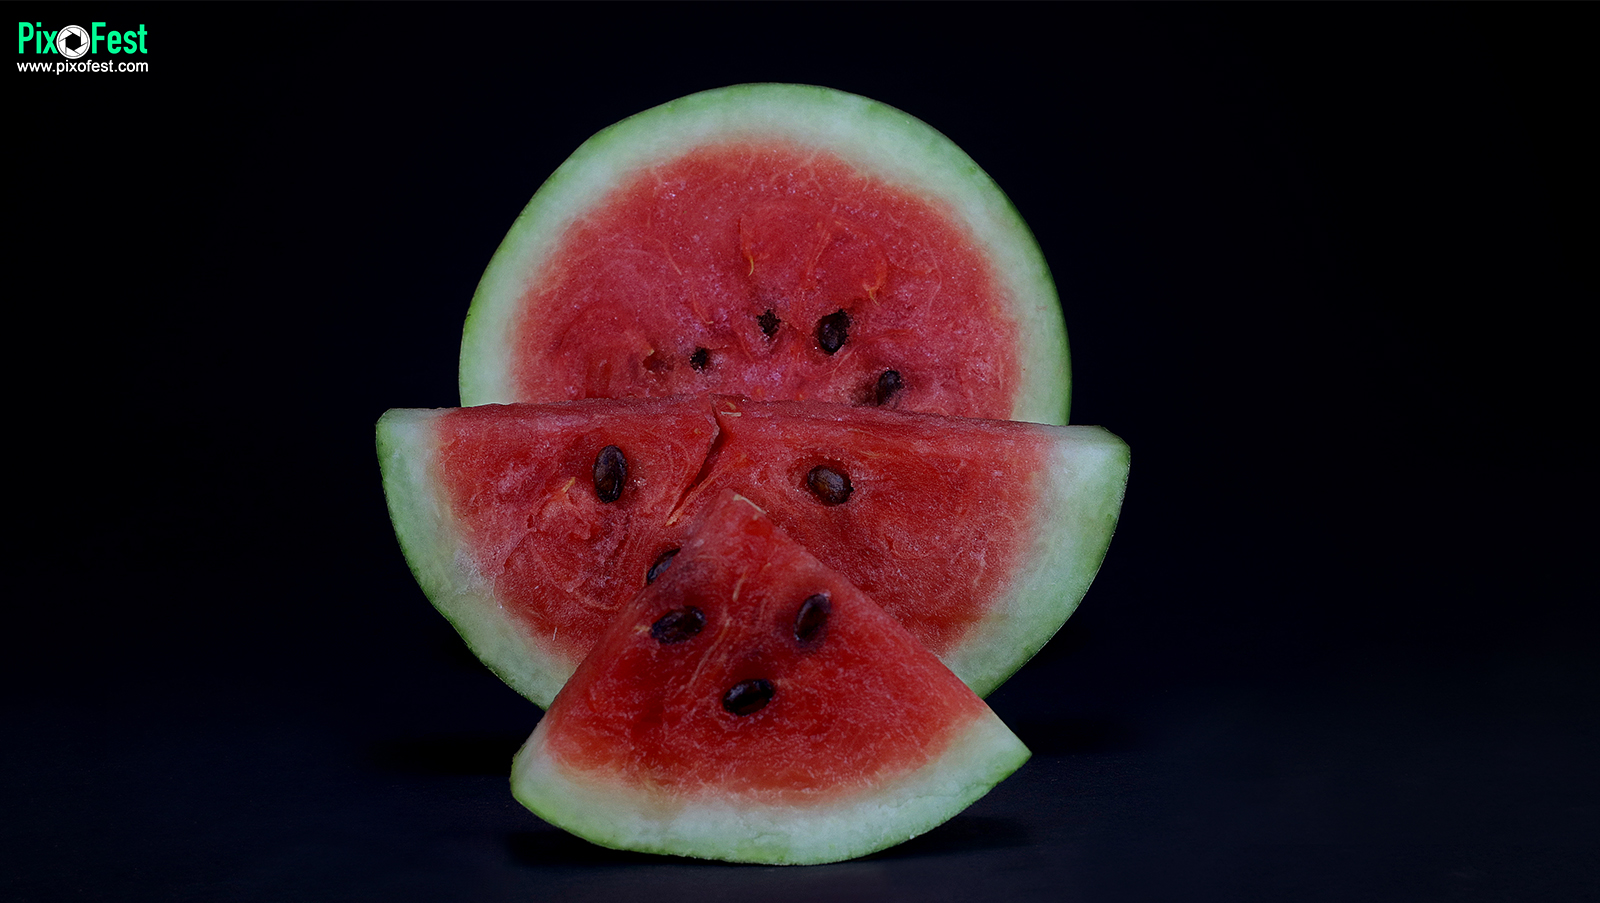 watermelon,fruit,summerfruit,healthyfruit,watermeloncalories,watermelonpiece,nutrition,pixofest